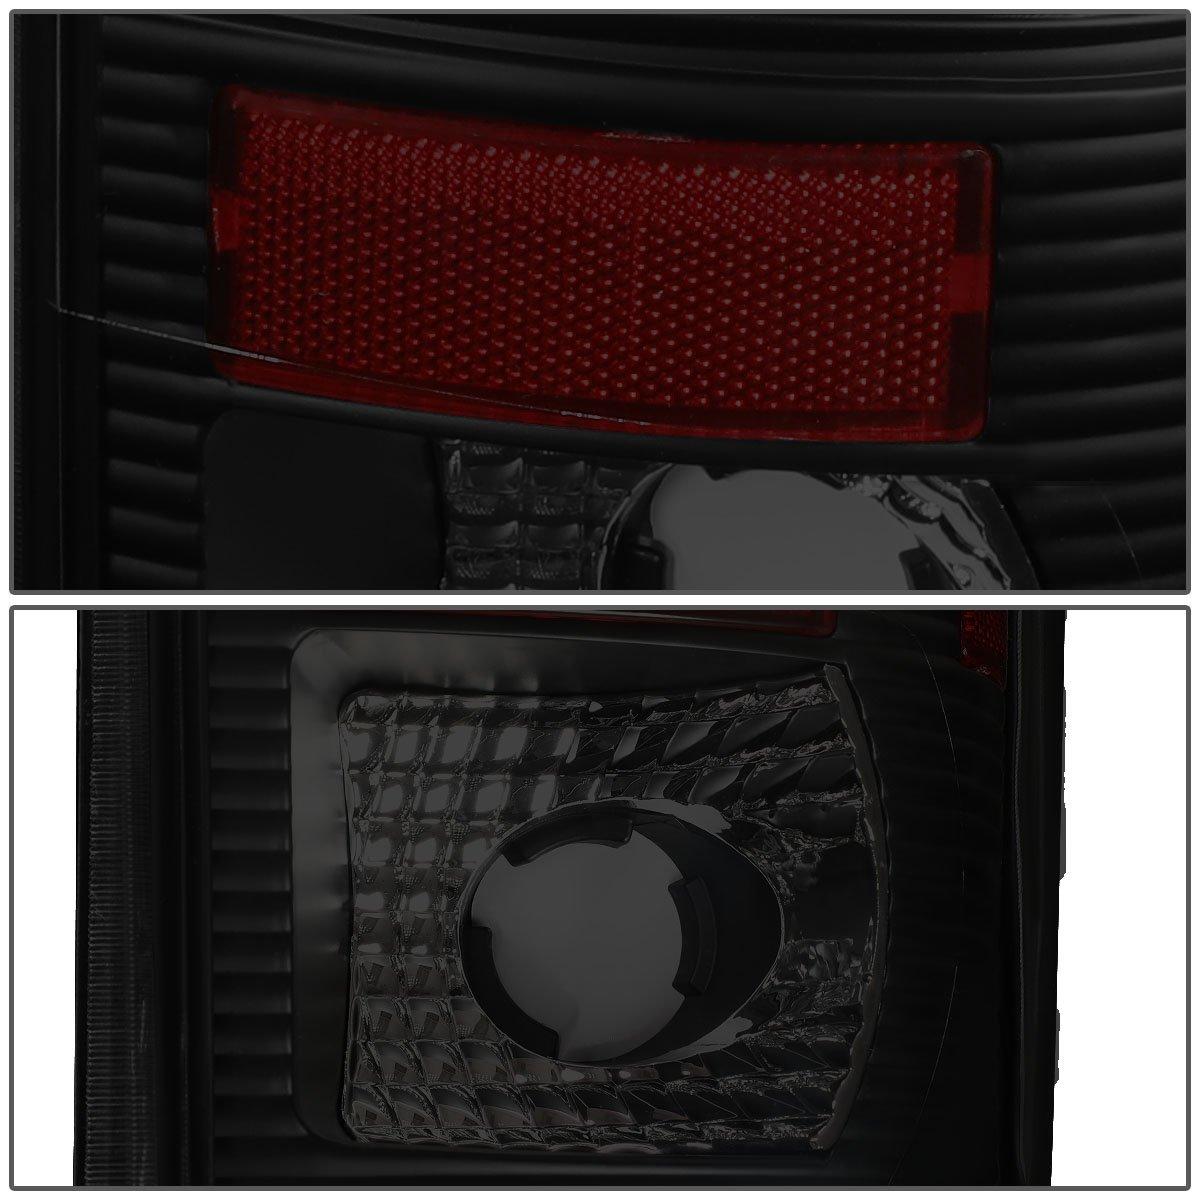 DNA Motoring TL-F15097-LED-RD3D-BK-SM 3D LED Tail Light Driver /& Passenger Side